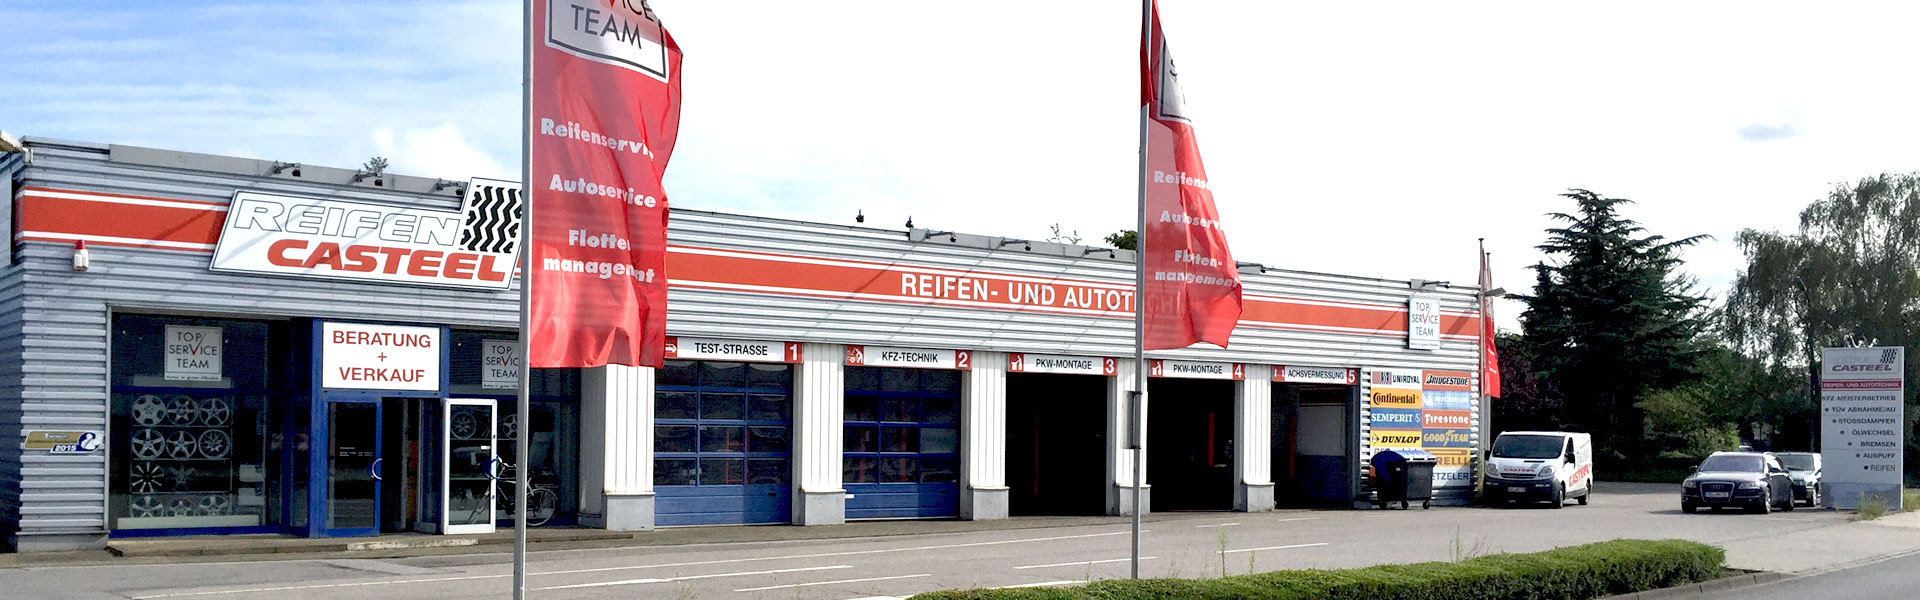 ReifenCasteel-Seitenimage-Bonn-ret